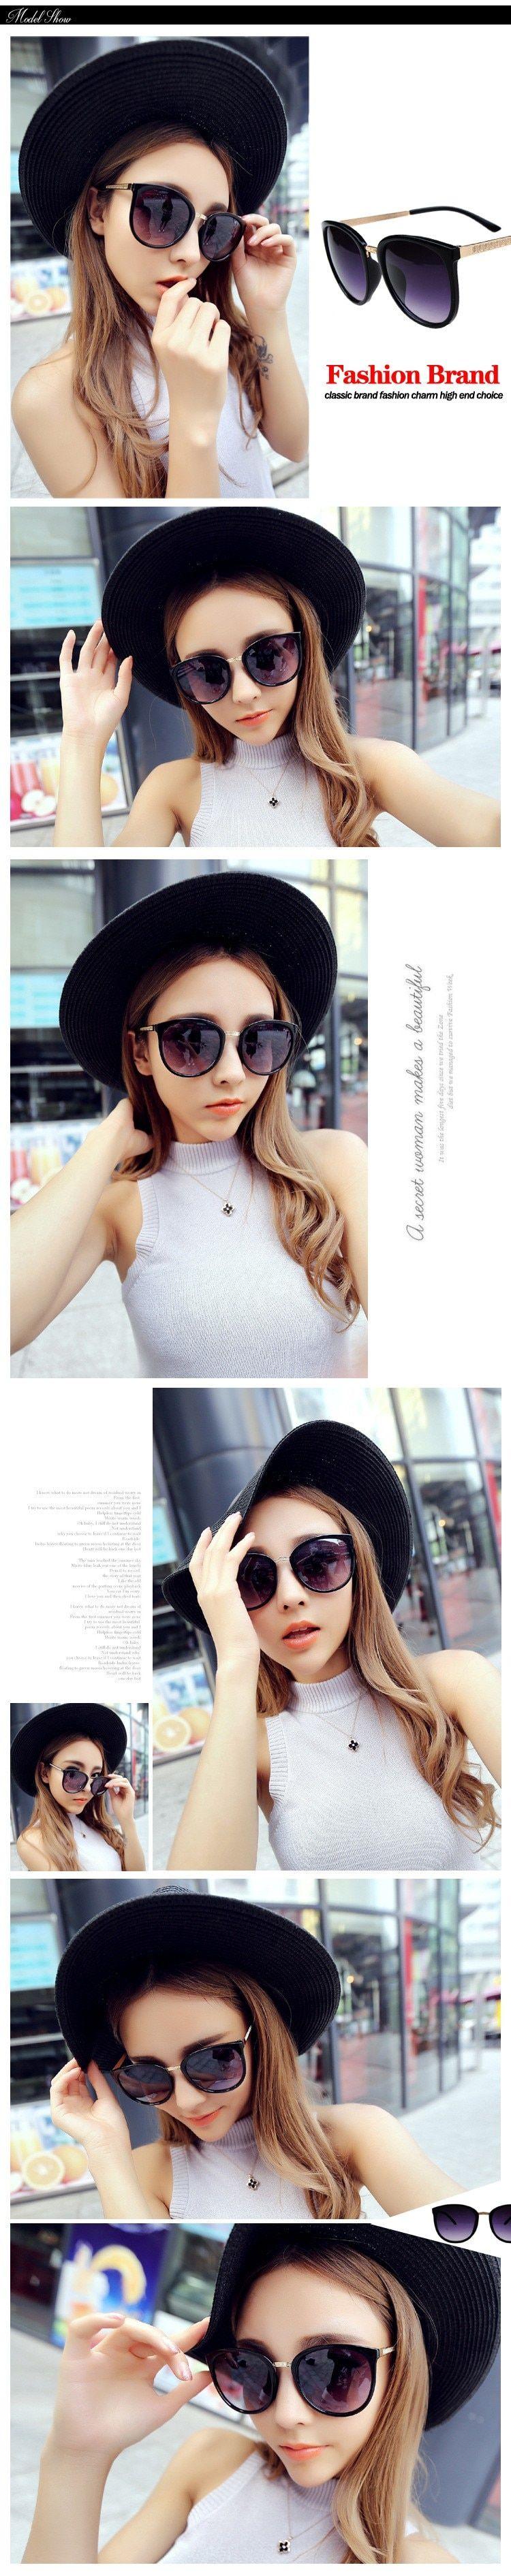 ca62aa02cda  15.72 - Awesome Round Fashion Glasses Oversized Sunglasses Women Brand  Designer Luxury Womens Eyeglasses Big Cheap